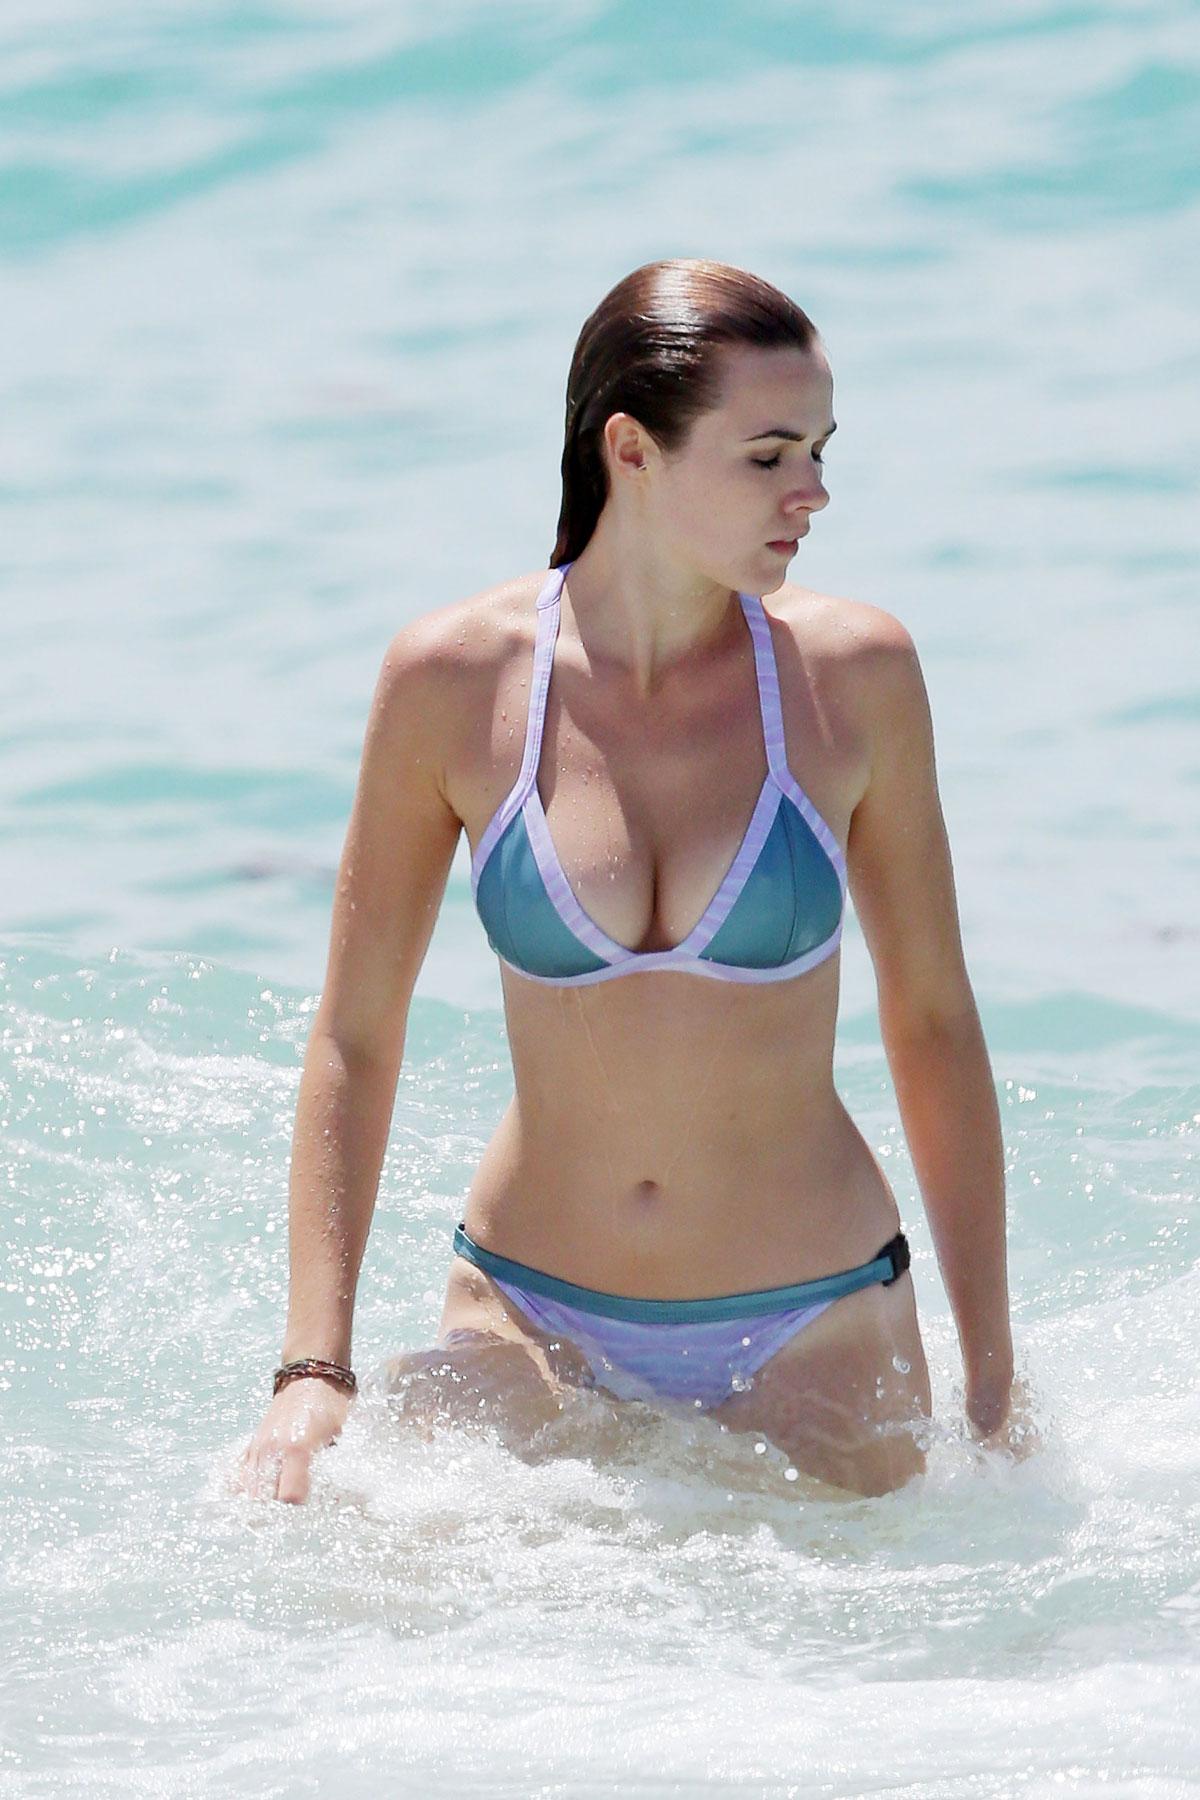 DEMI HARMAN in Bikini on the Beach in Sydney - HawtCelebs